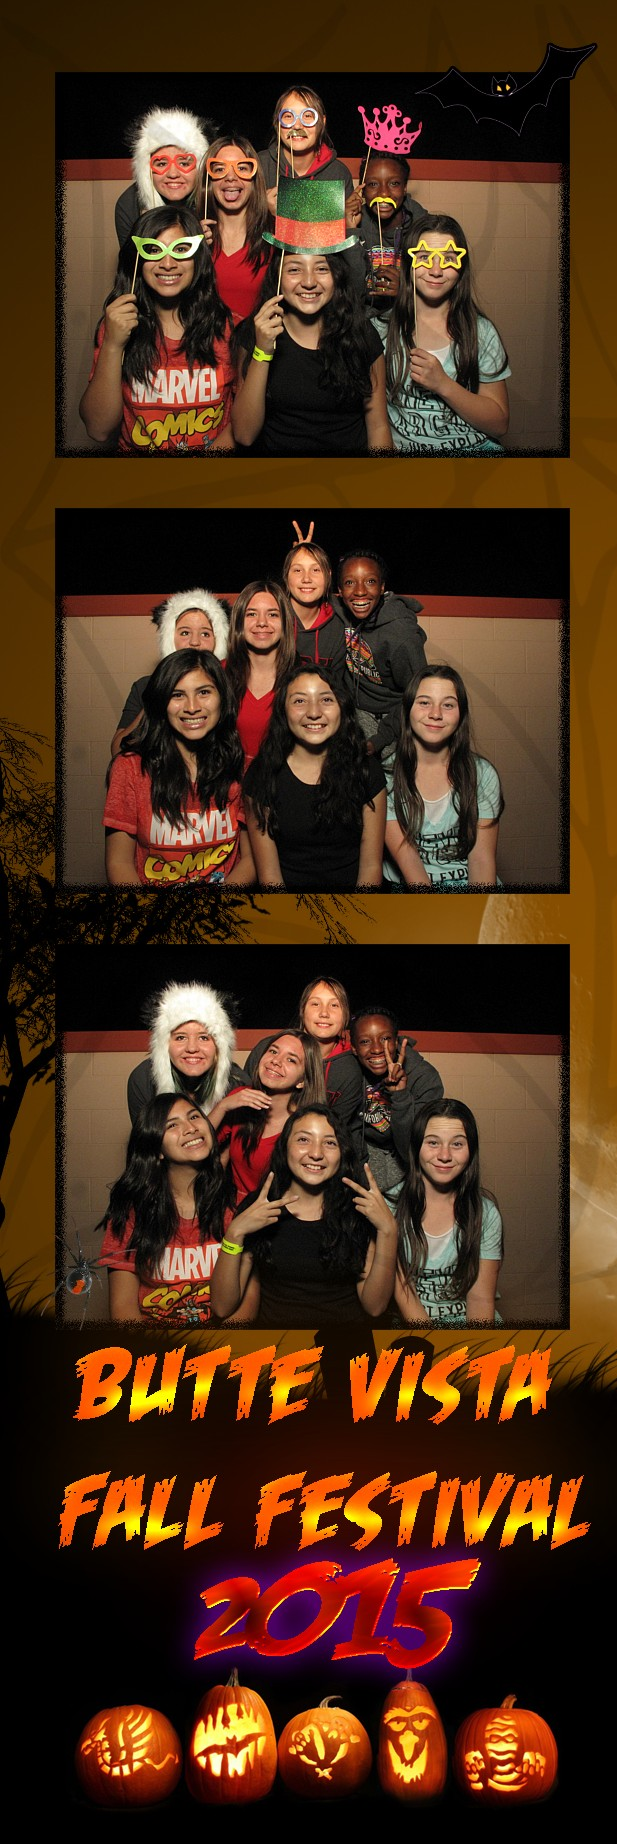 Butte Vista Fall Festival 2015